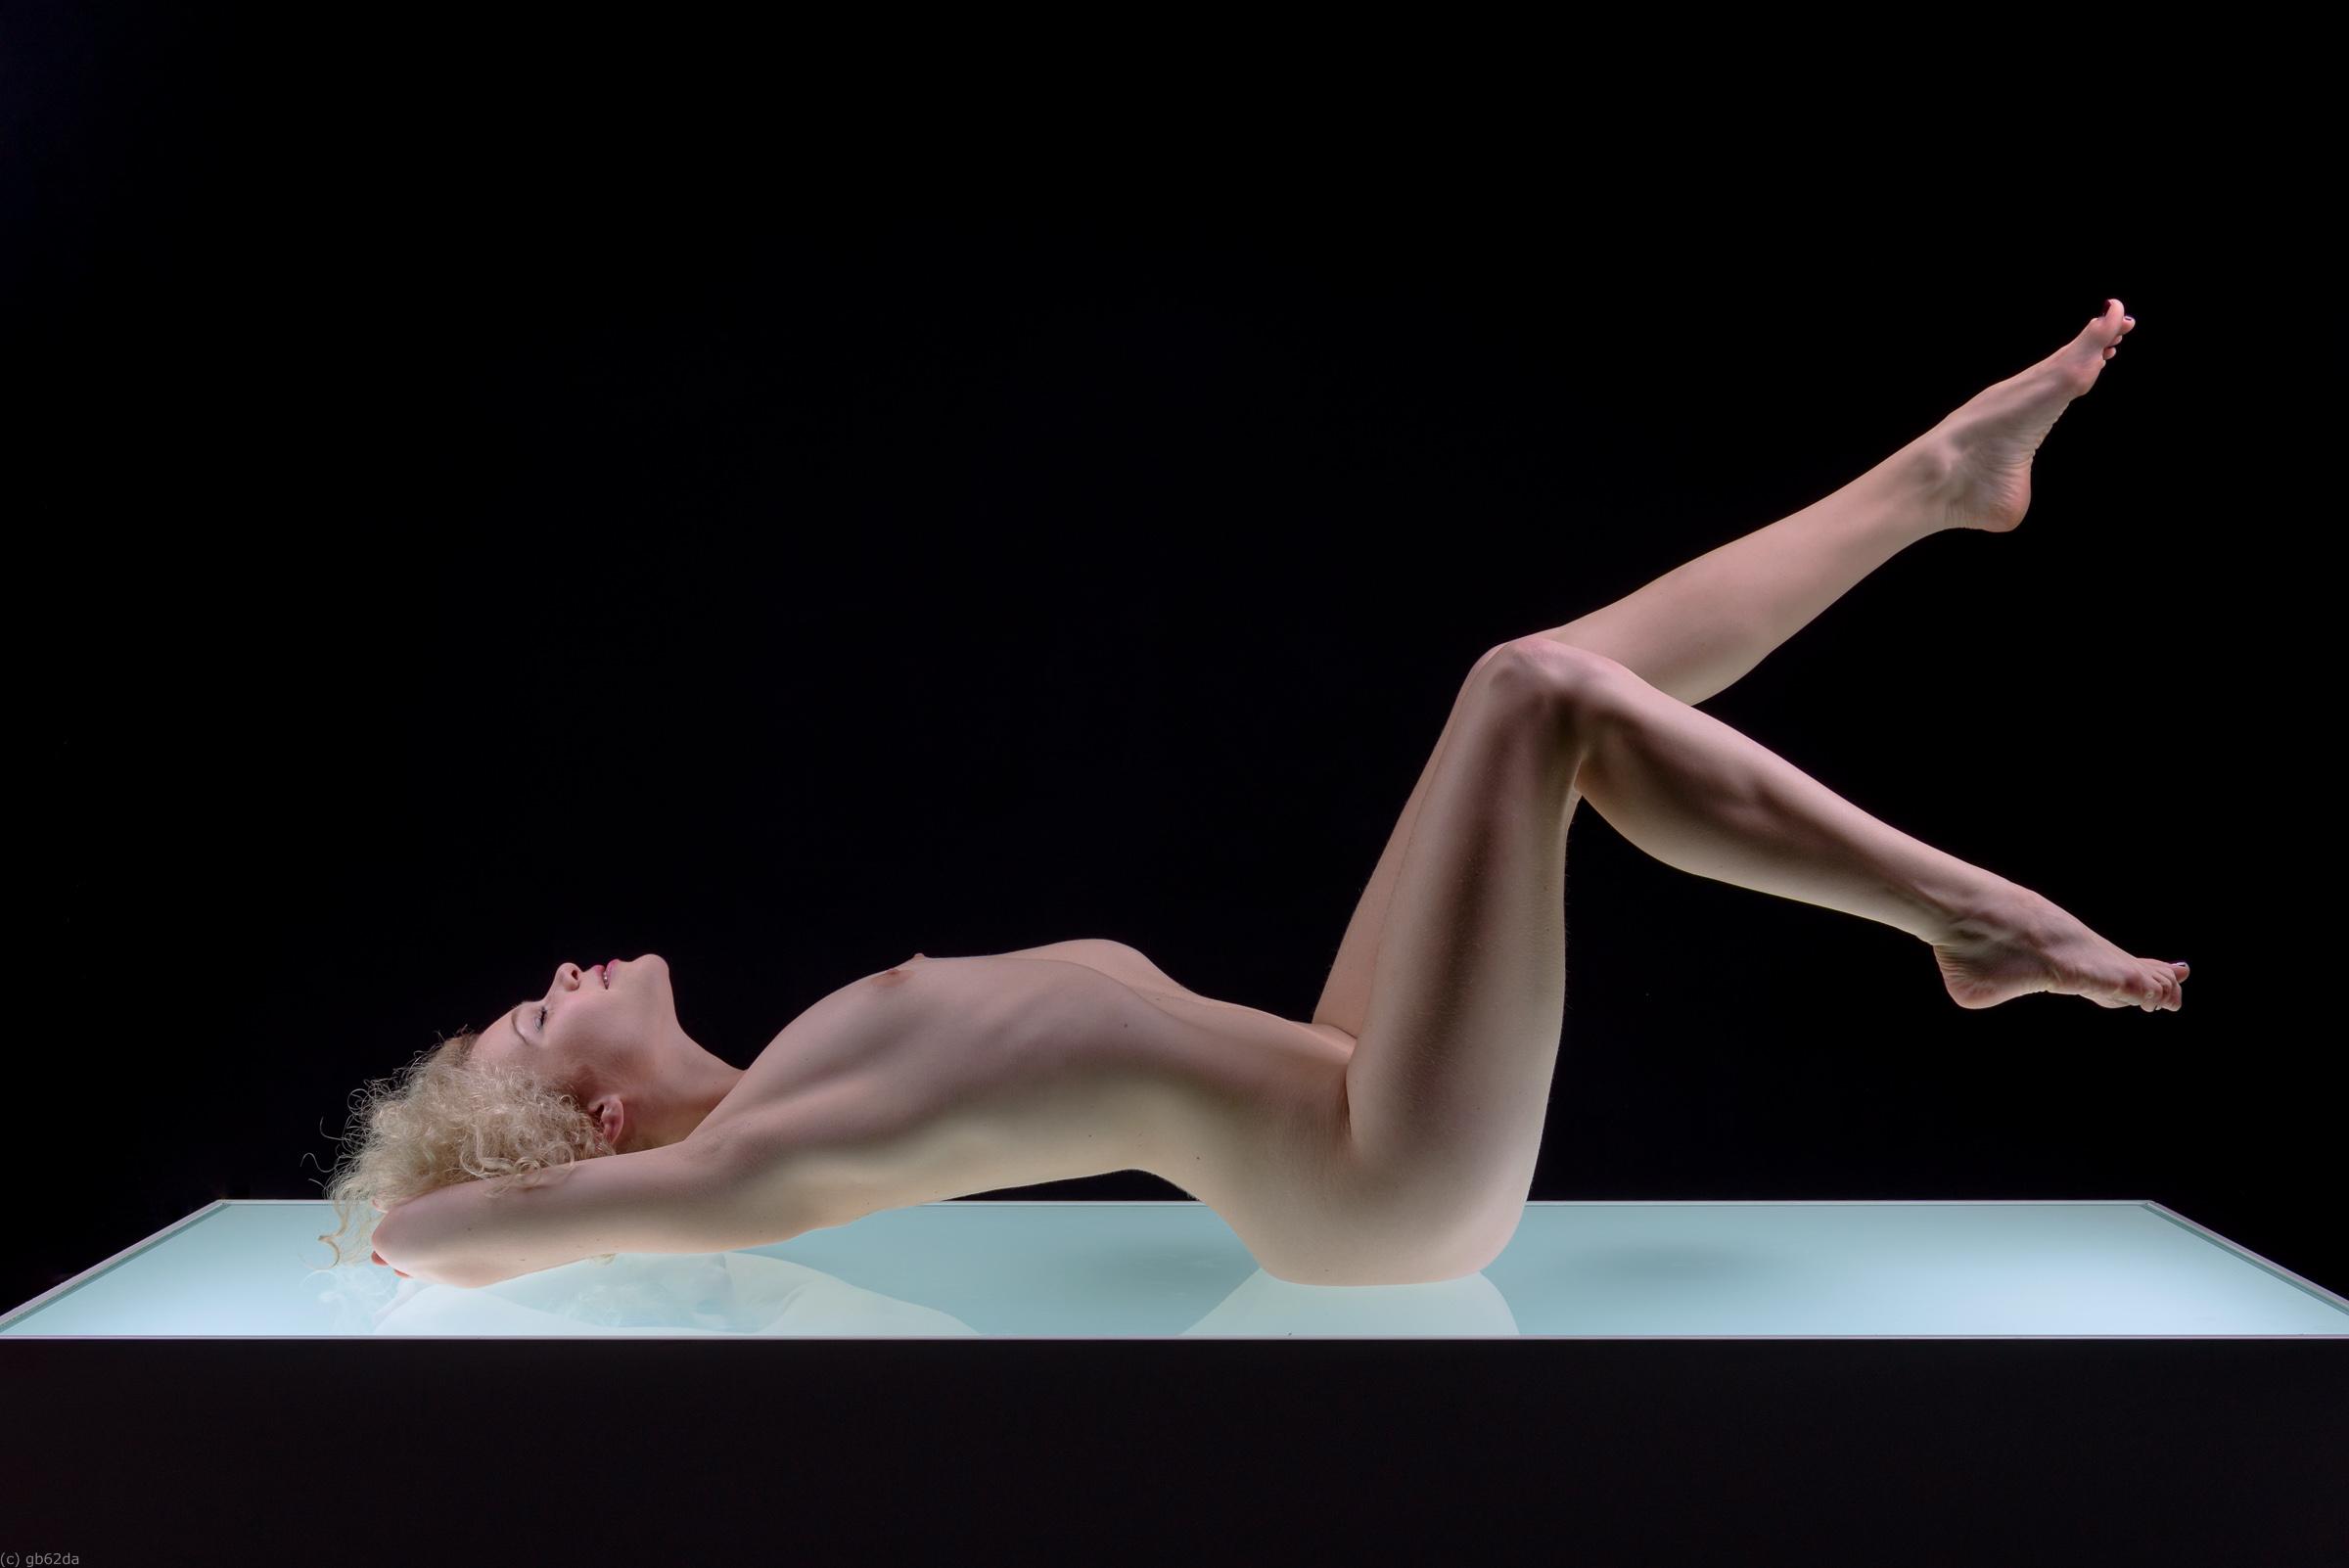 Deviantart Artistic Nude 69